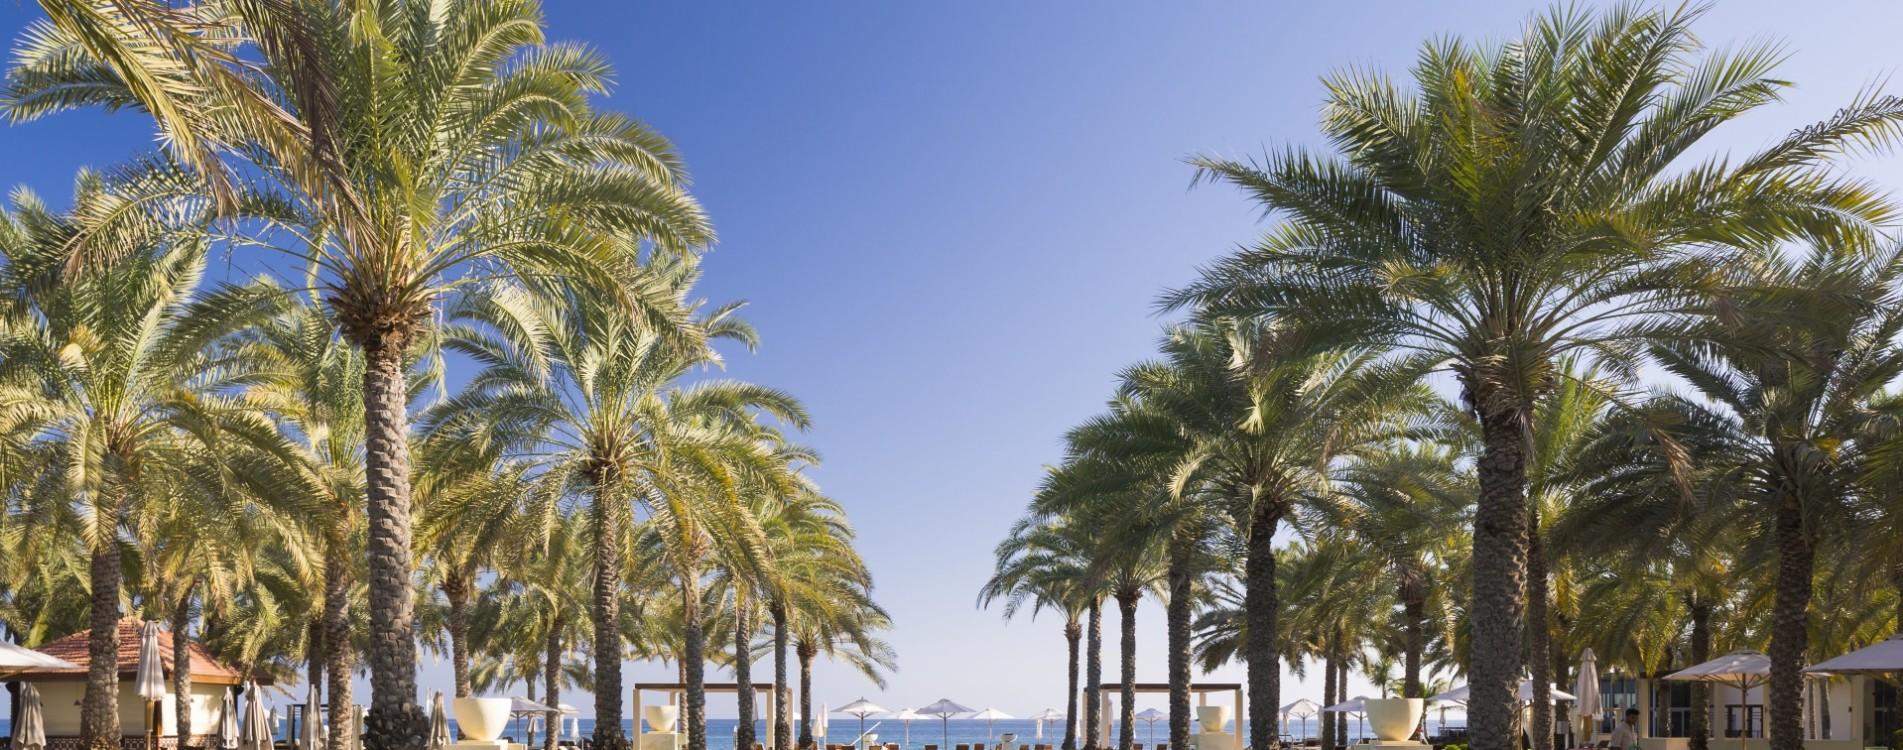 Al-Bustan-Palace-Muskat-Infinity-Pool-Exterior-Oman.jpg